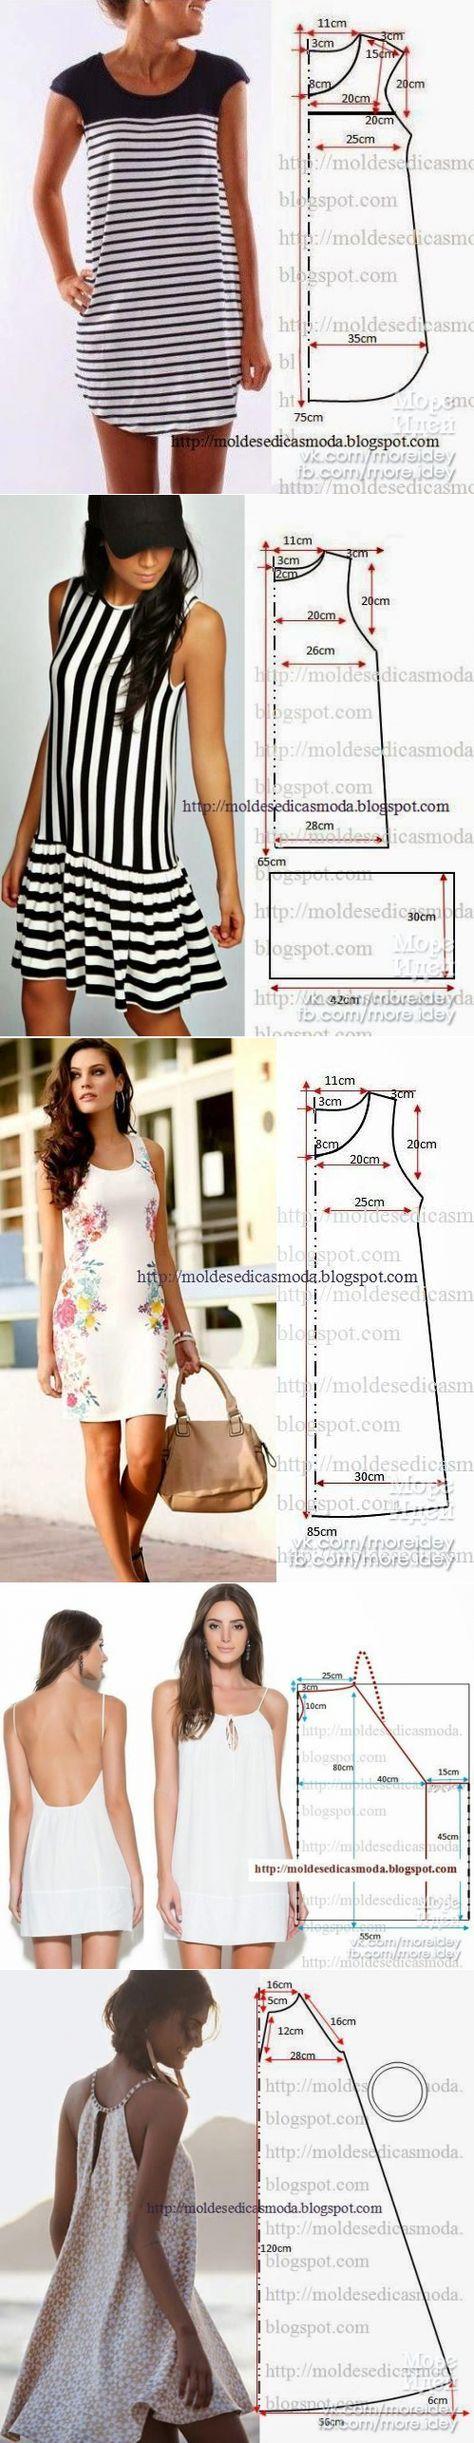 Kleider | Diy | Pinterest | Pines populares, Costura y Patrones